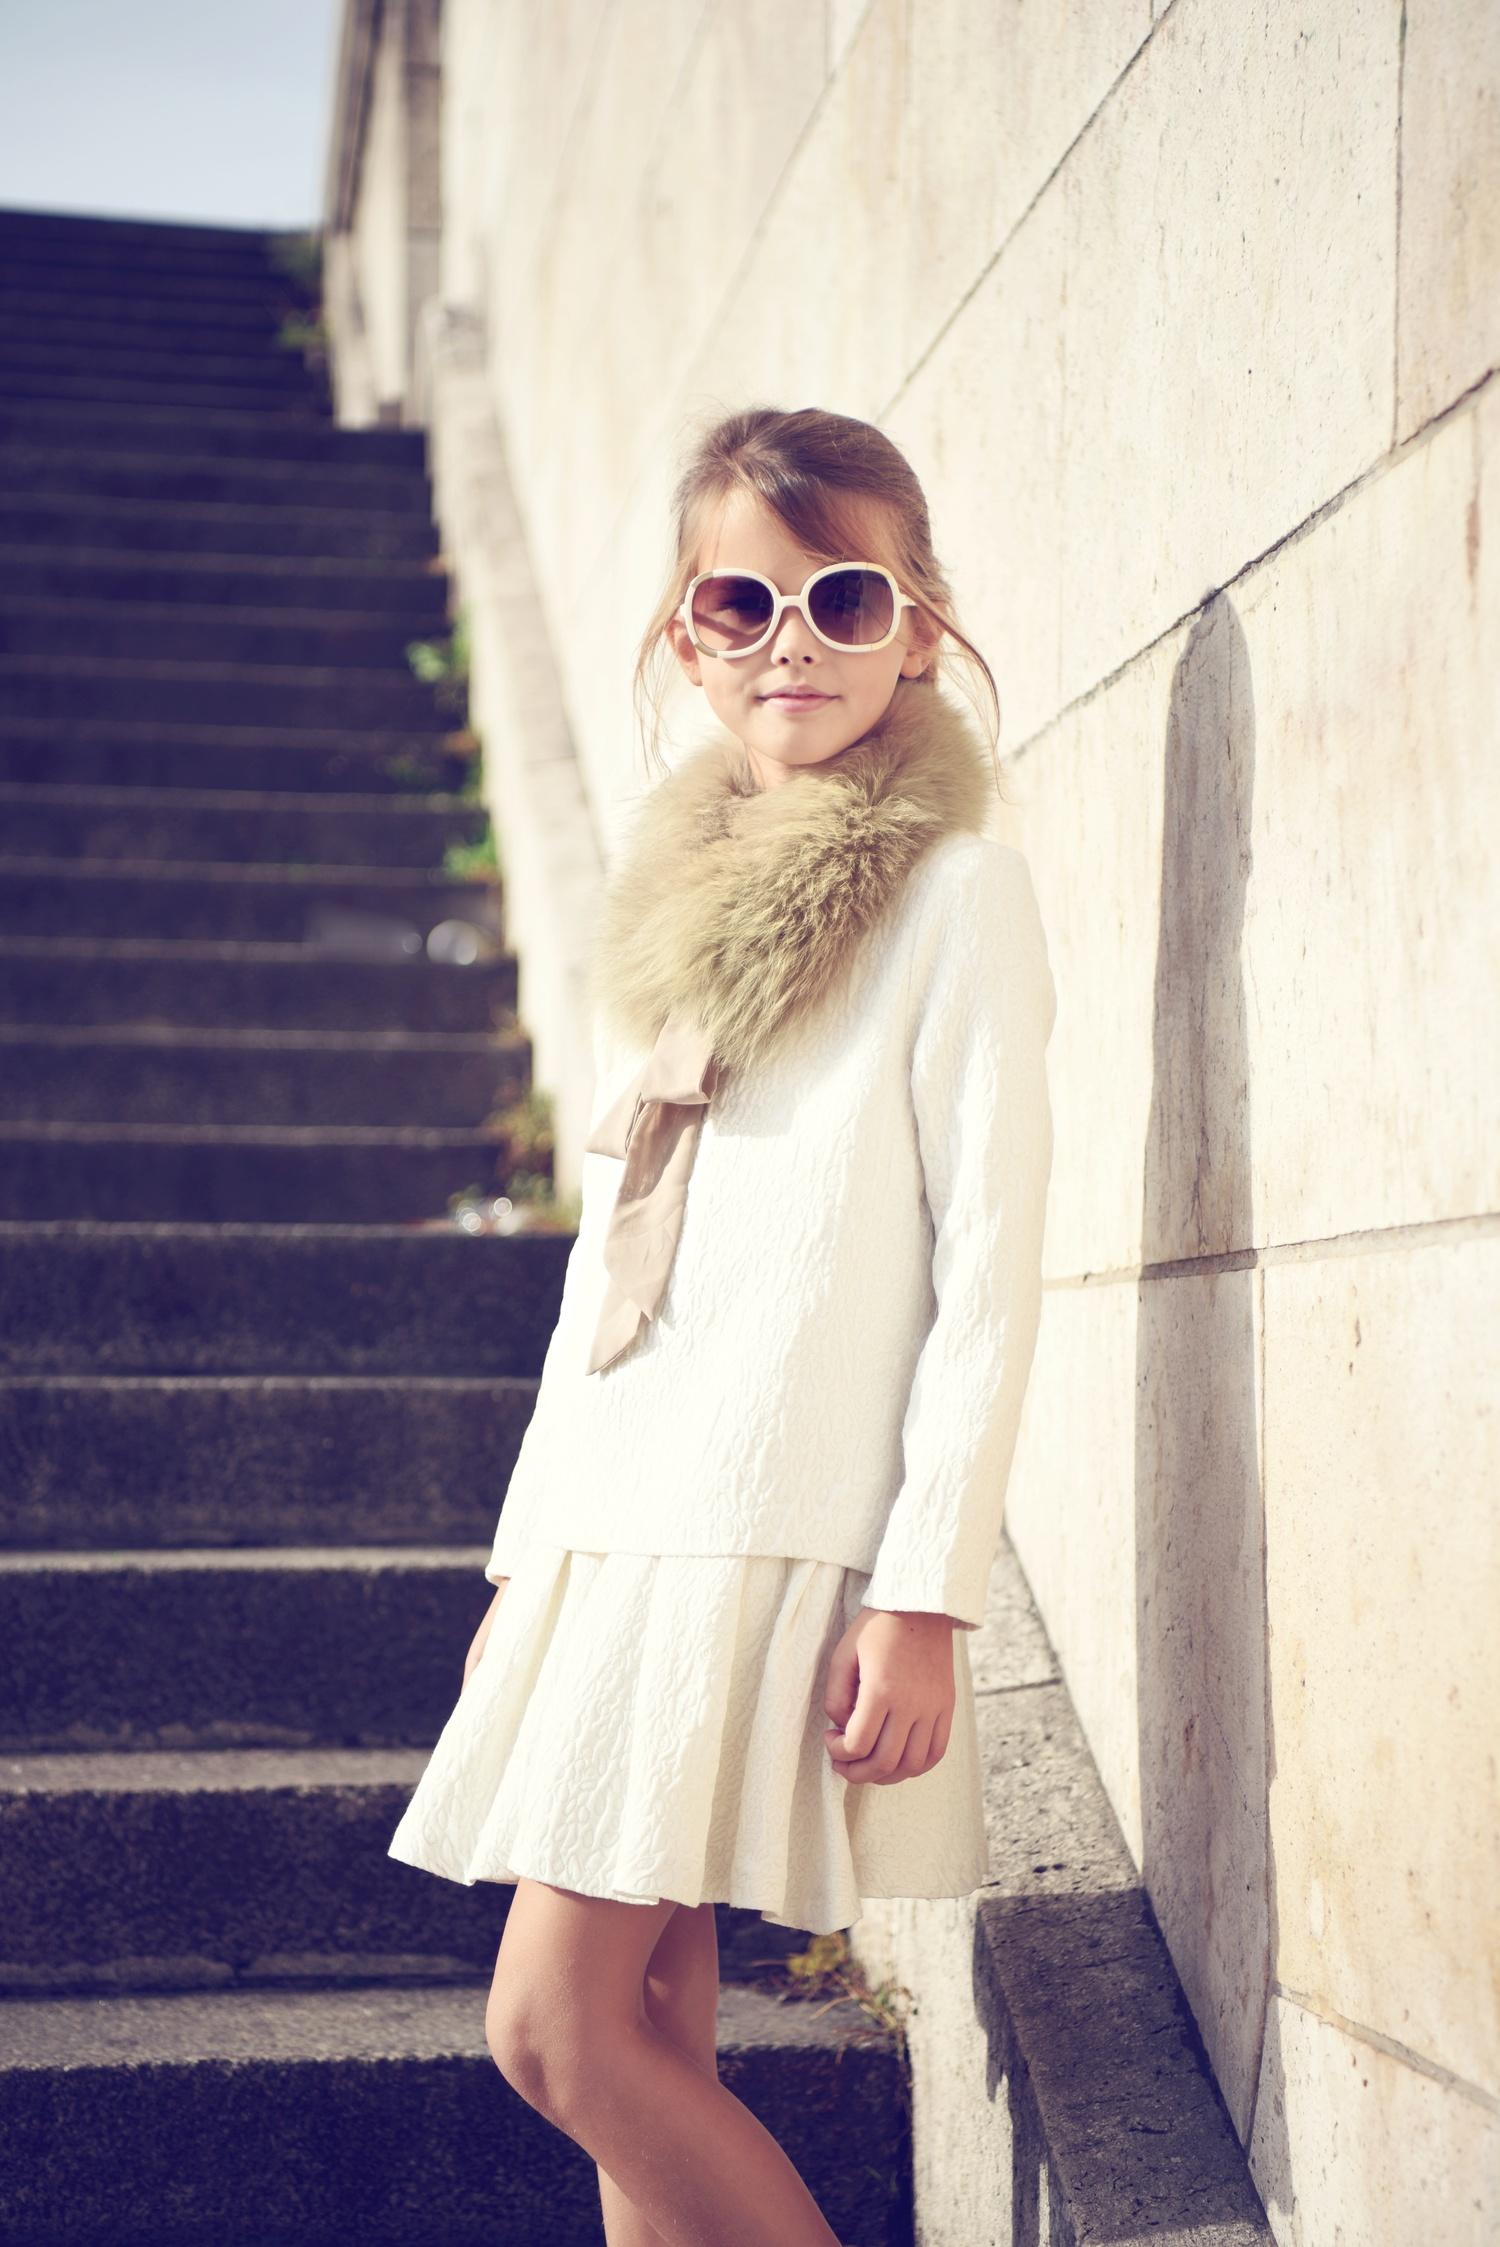 Enfant+Street+Style+by+Gina+Kim+Photography-9.jpeg